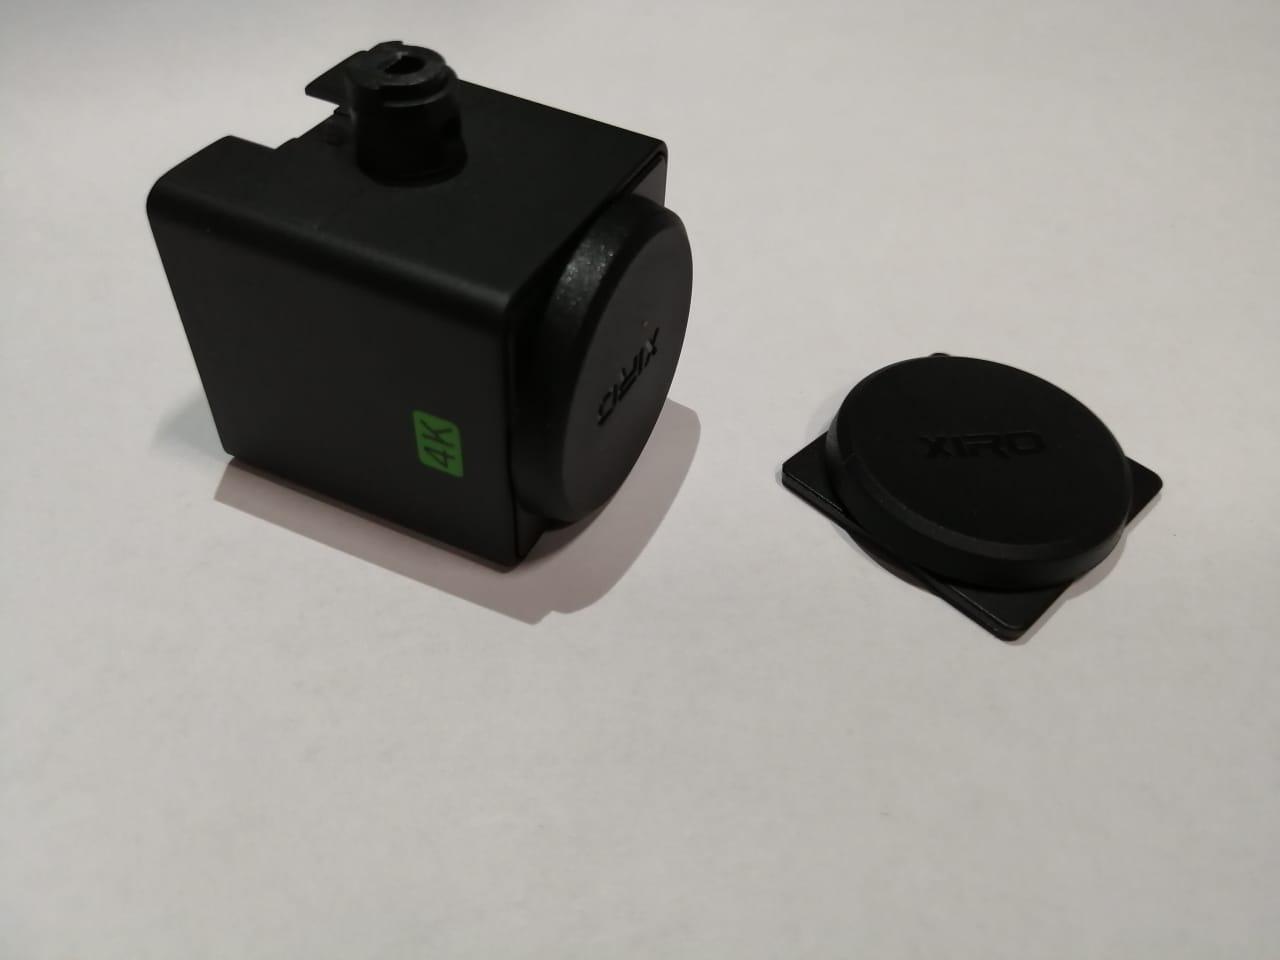 Корпус камеры XIRO Запчасти Xplorer - 4K